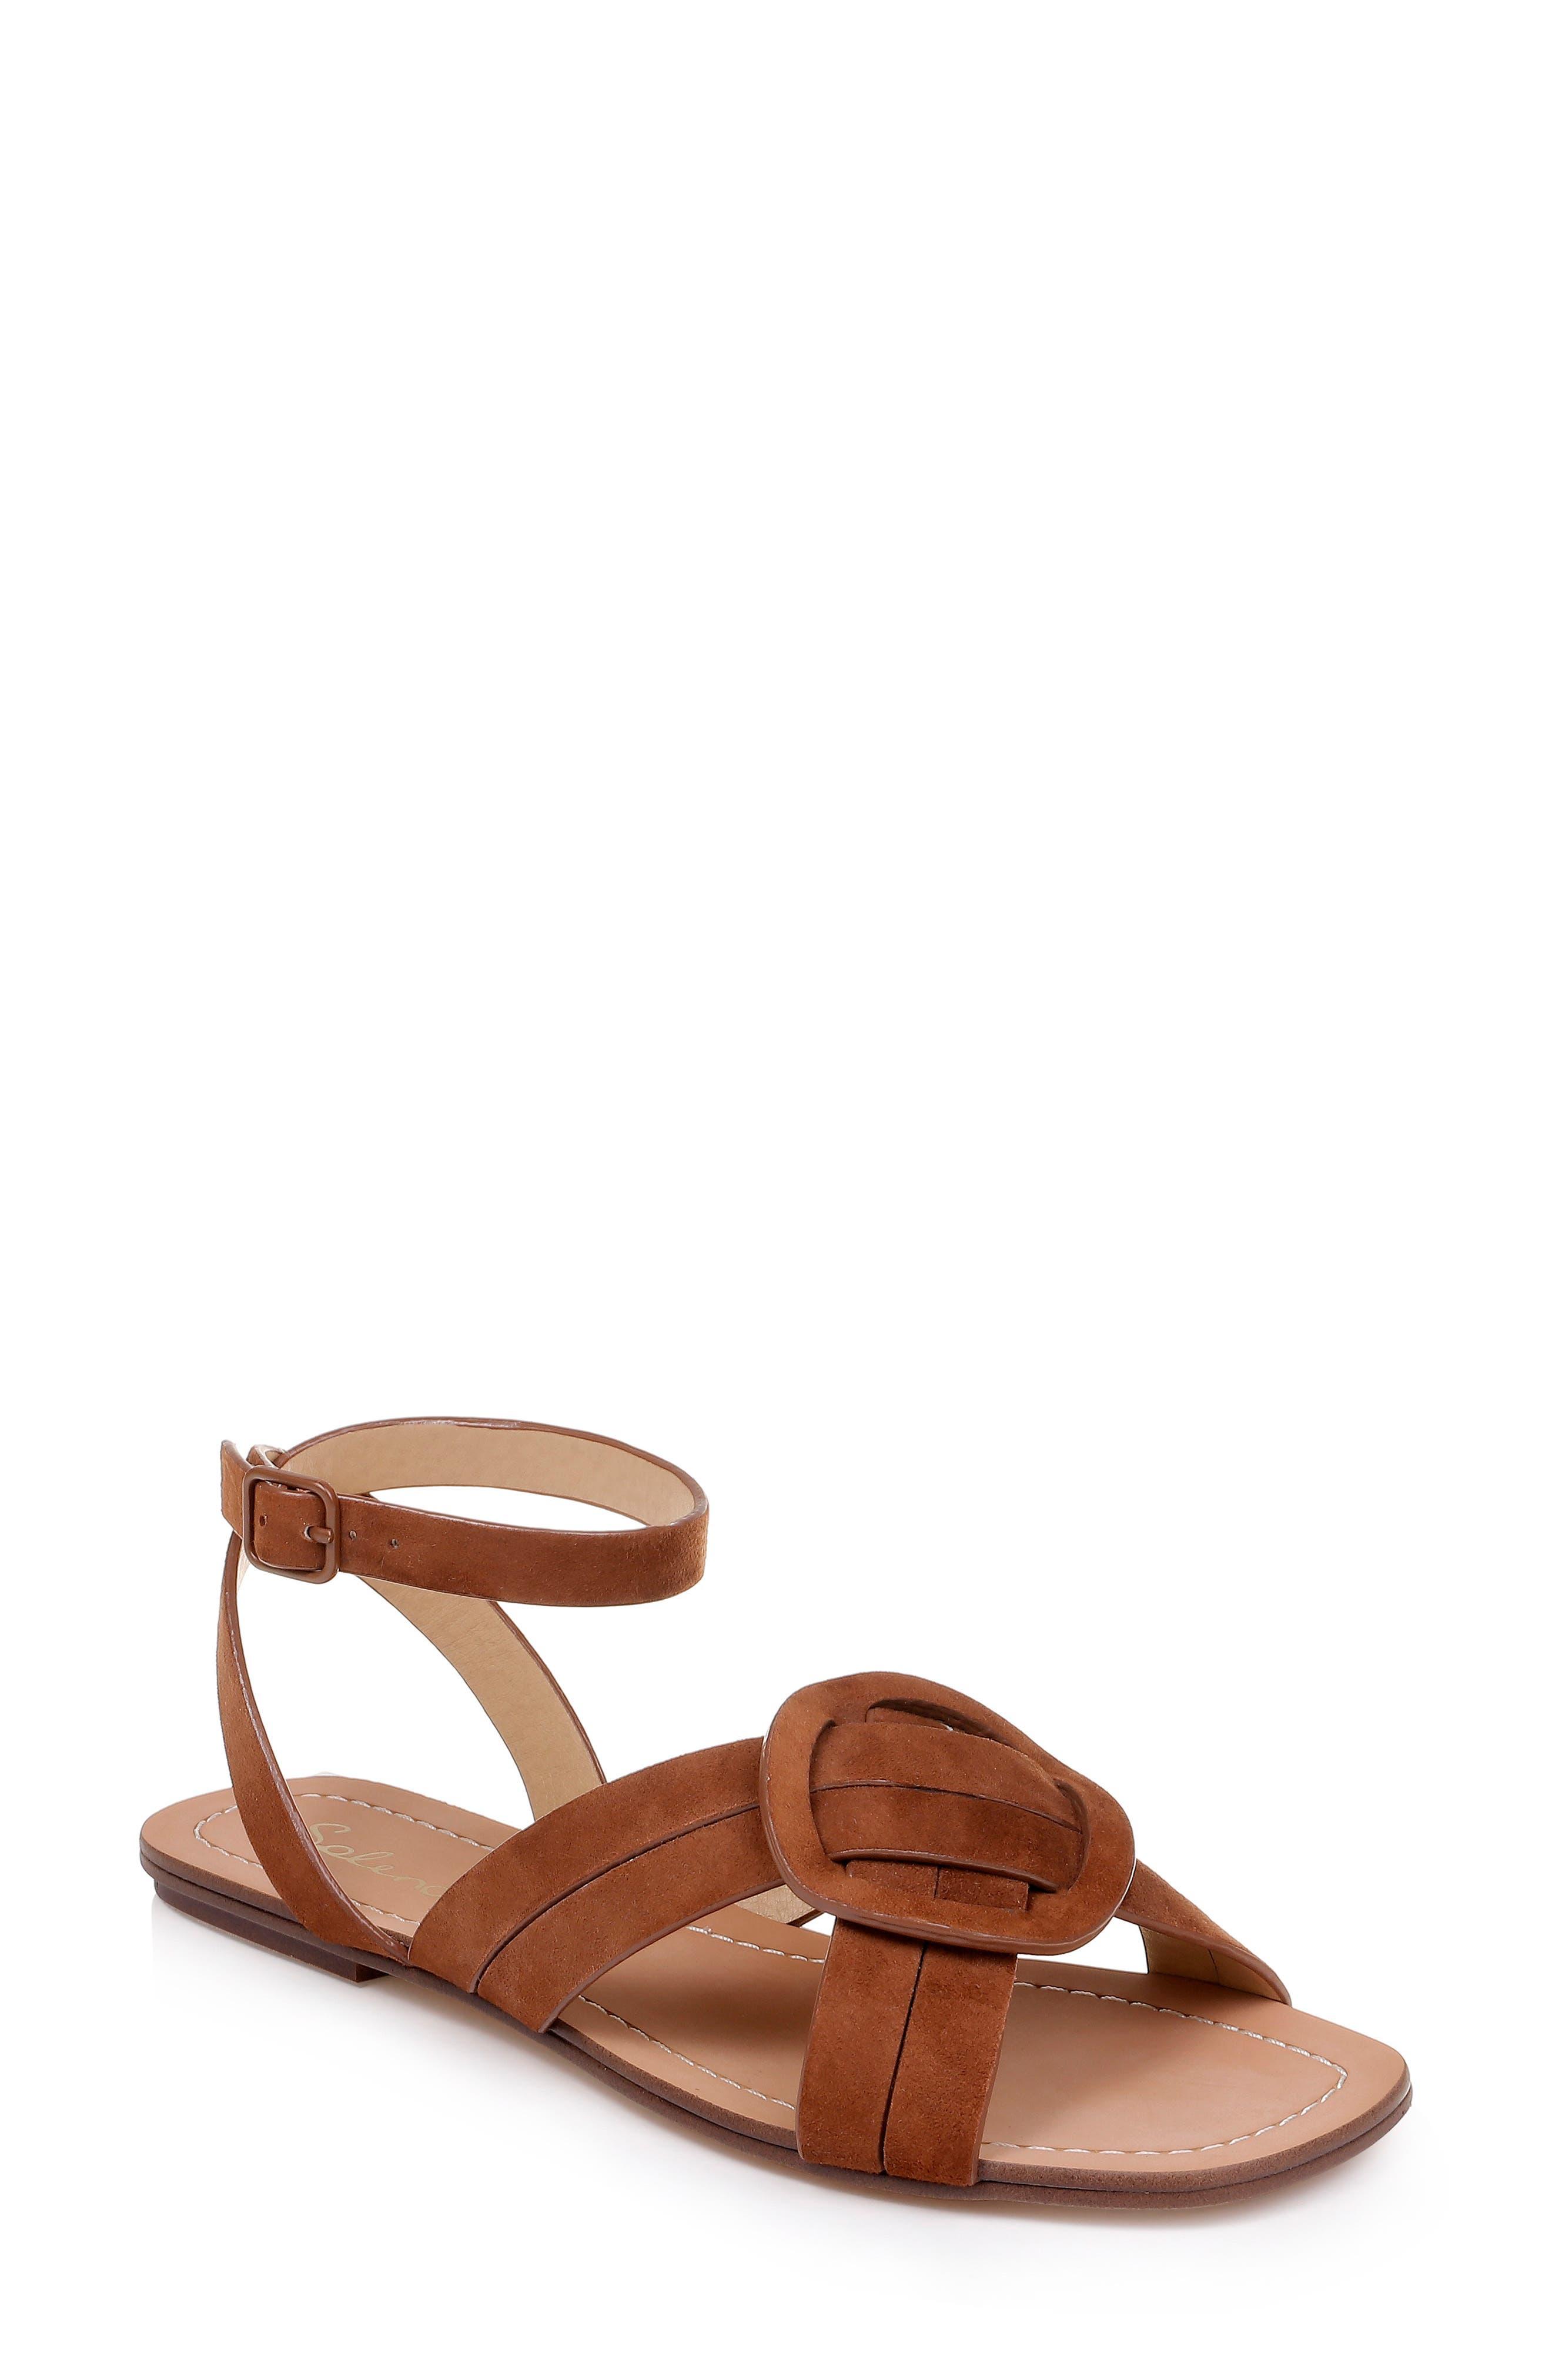 Talea Ankle Strap Sandal, Main, color, CHESTNUT SUEDE